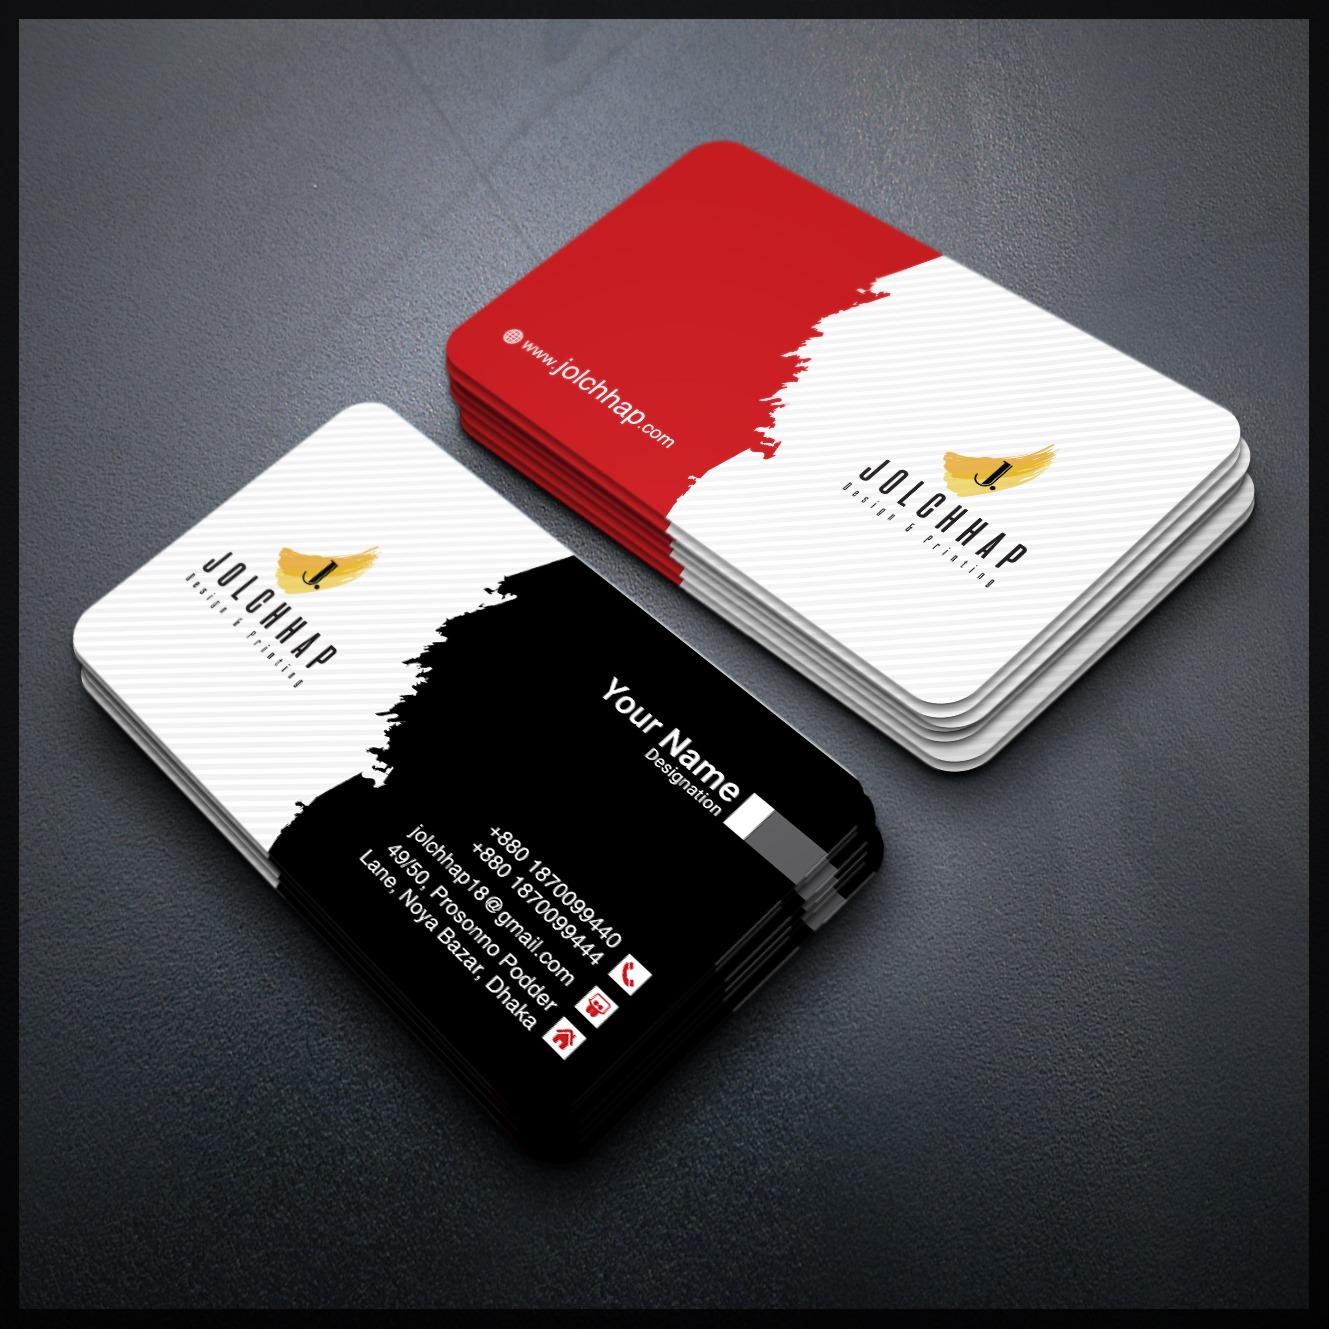 I will provide creative business card design